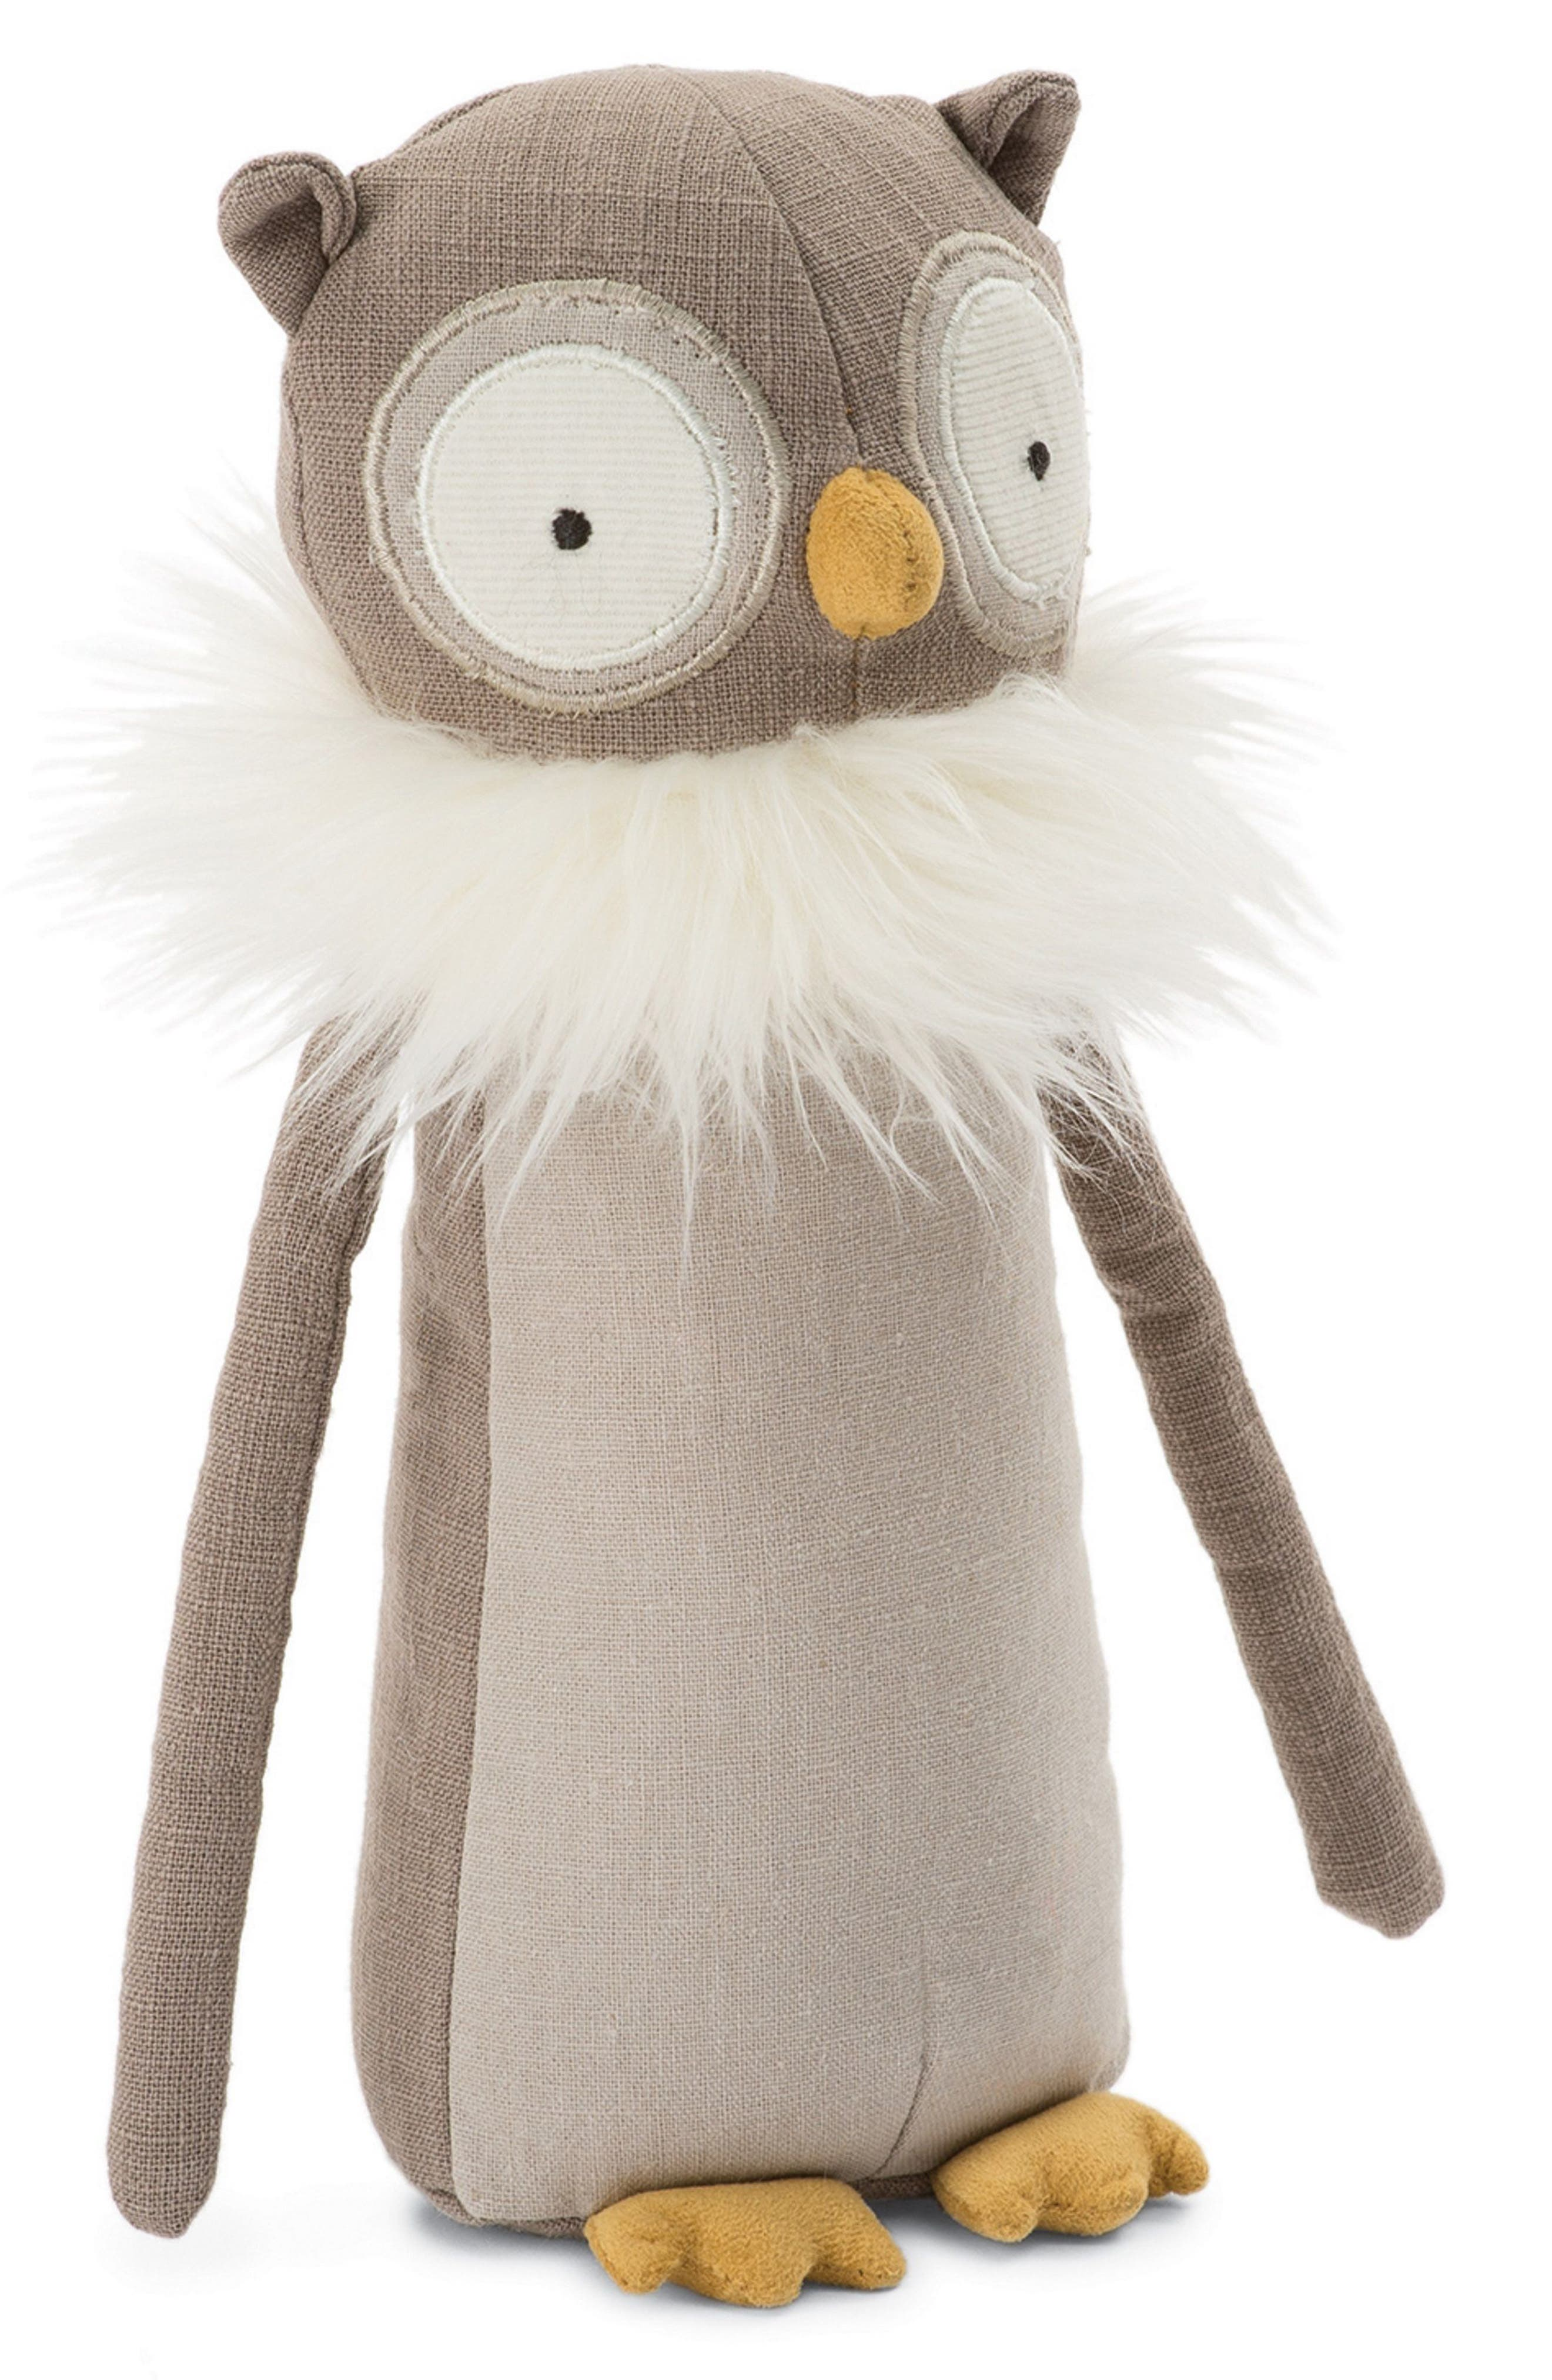 Main Image - Jellycat Skandoodle Owl Stuffed Animal